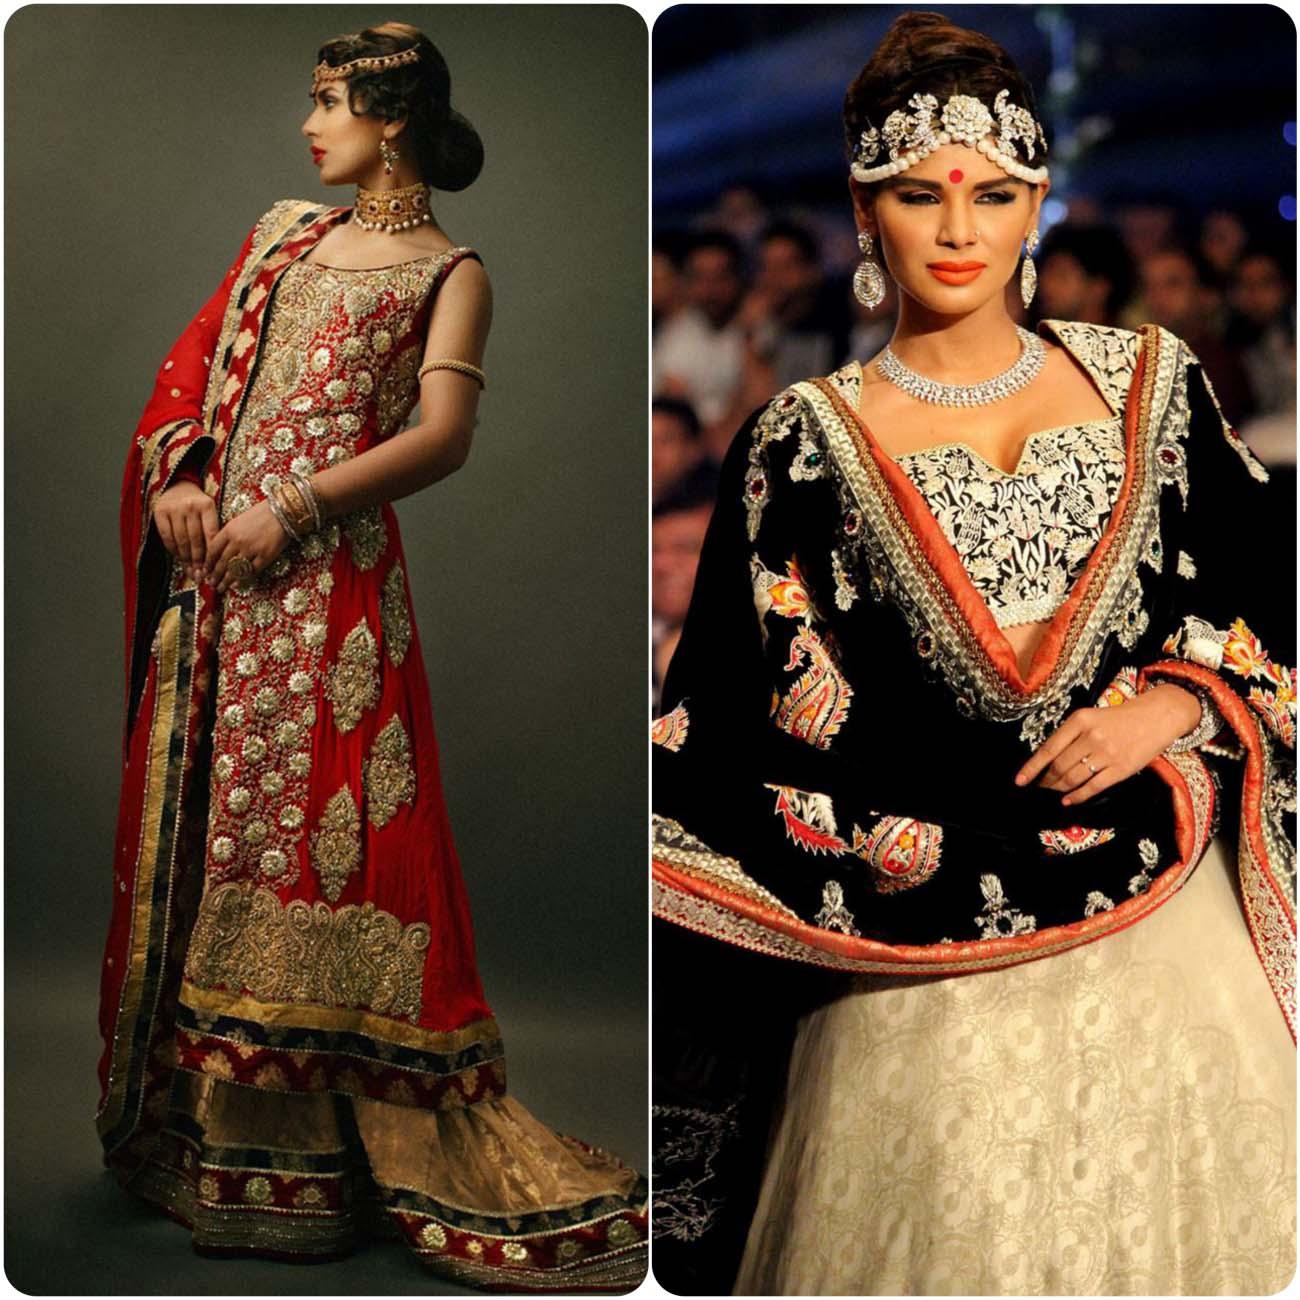 Deepak perwani Wedding Dresses Collection Fo Women 2016-2017...styloplanet (8)